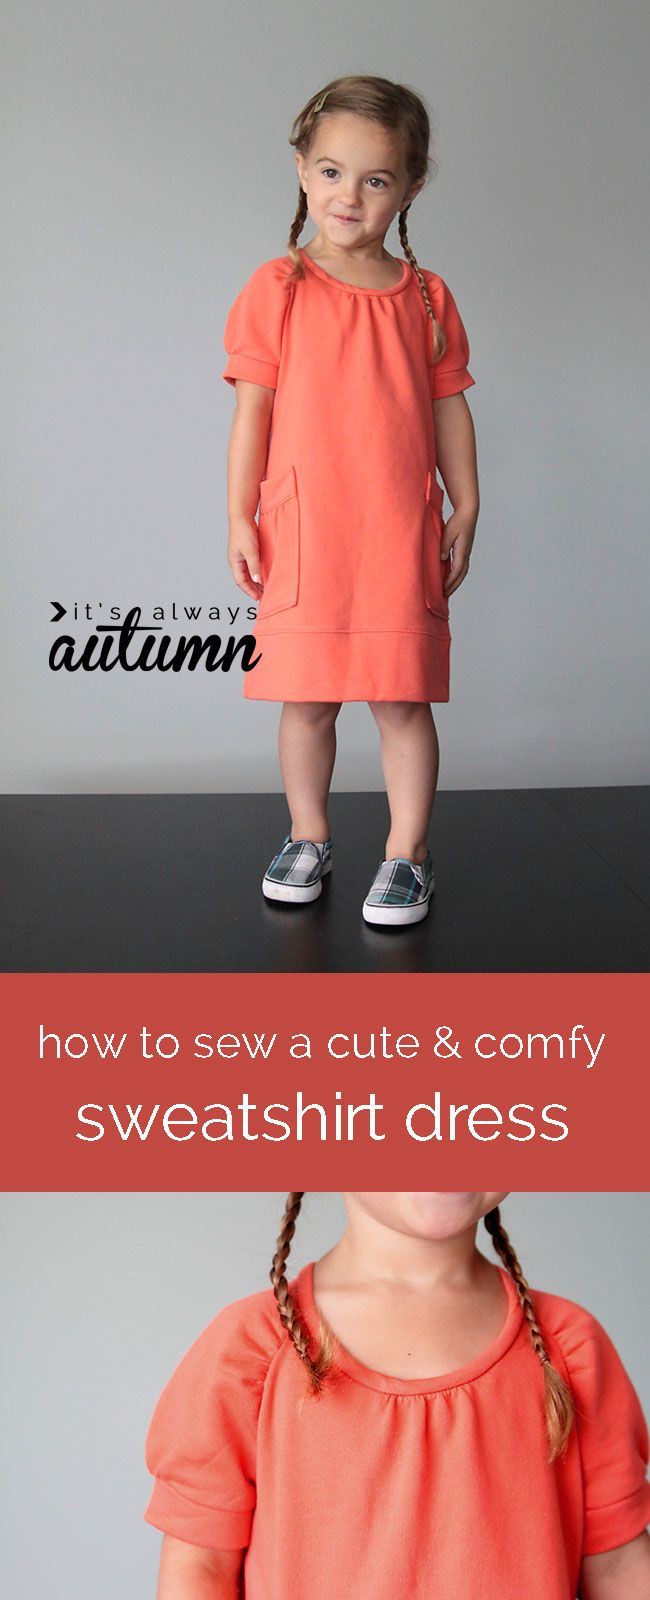 Cute u comfy sweatshirt dress girls sewing tutorial sweatshirt dress